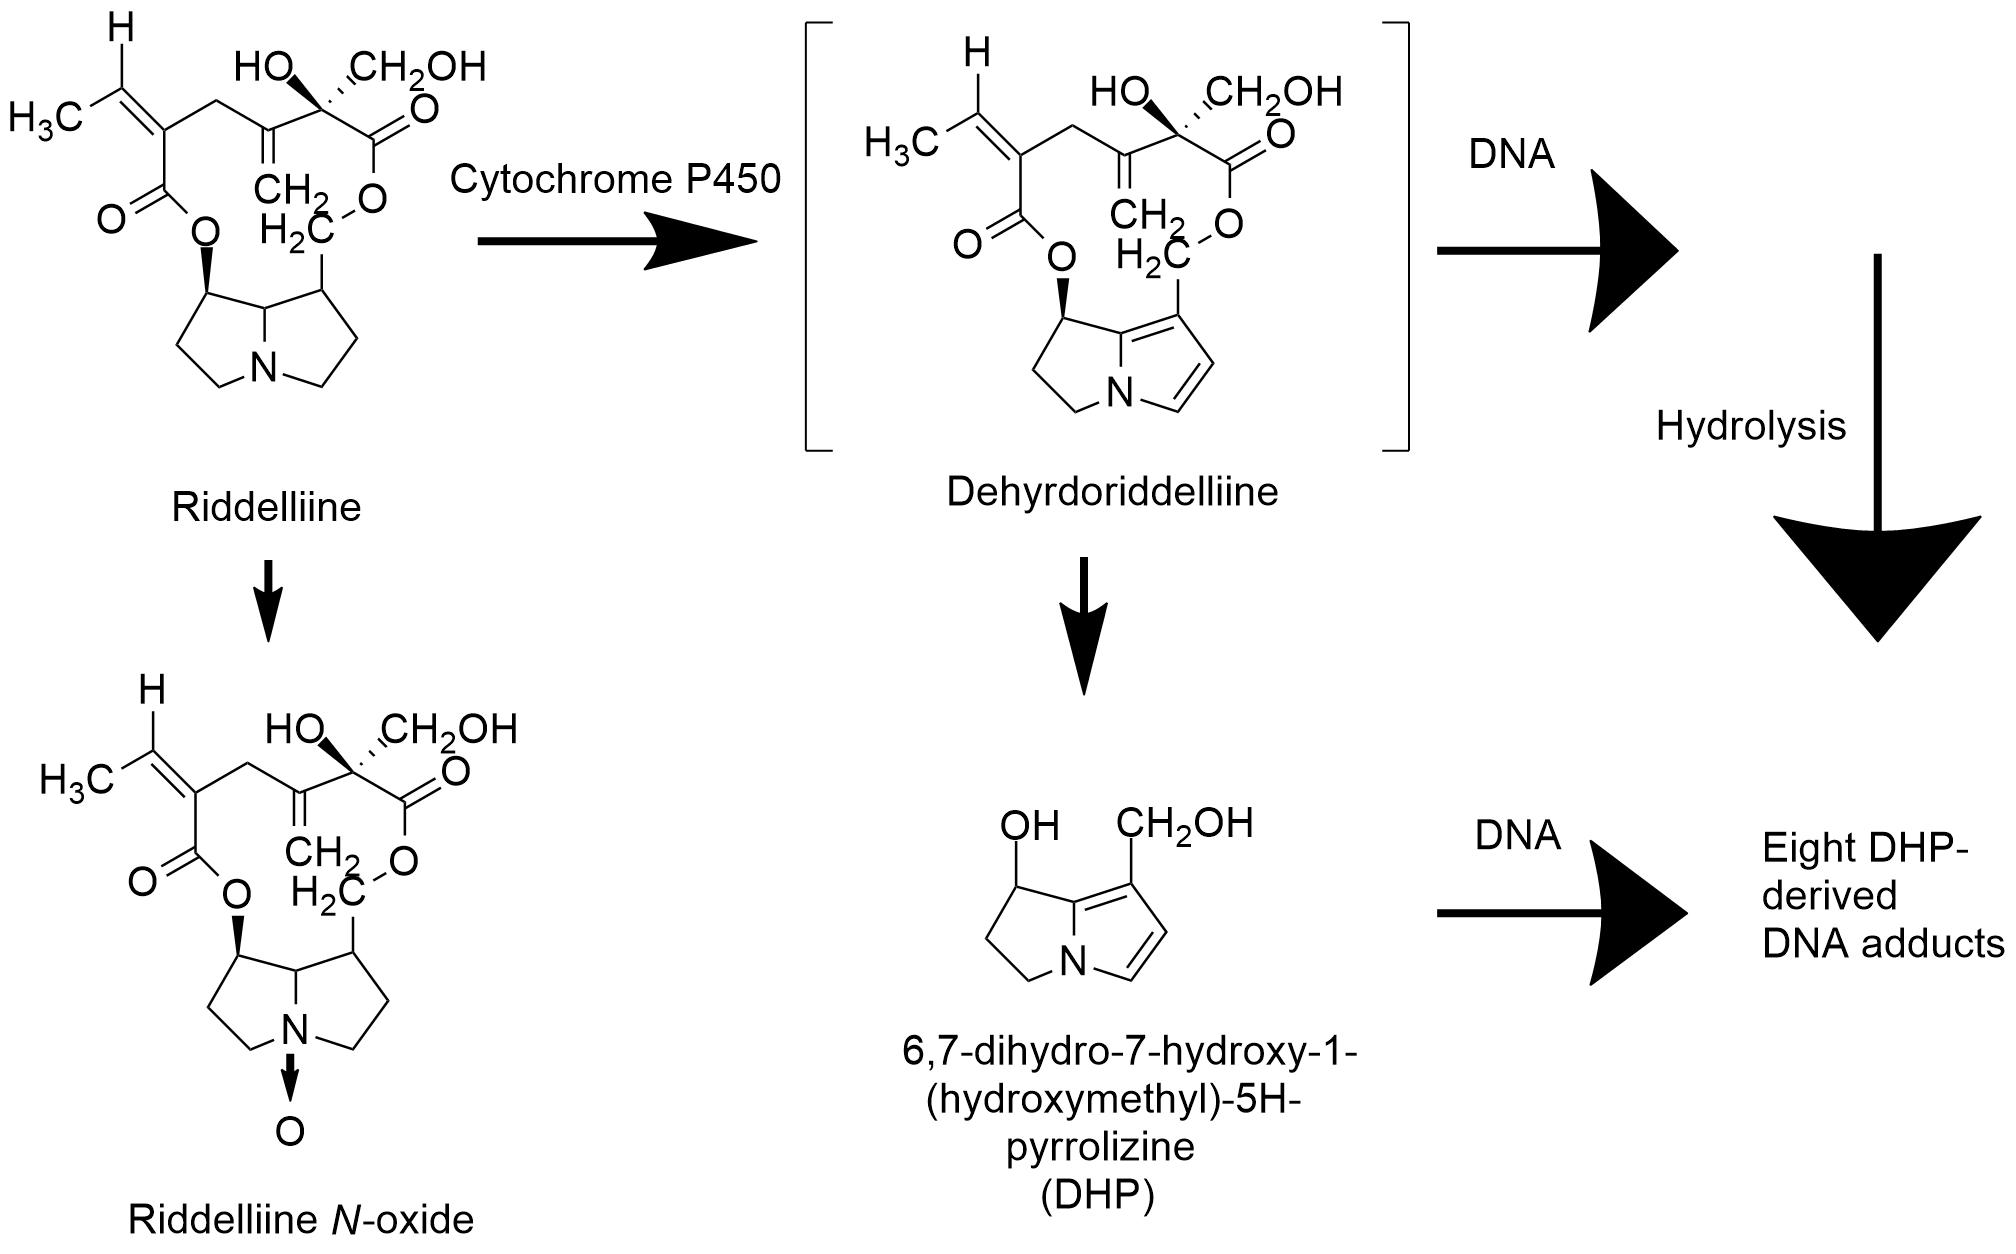 Fileoxidative Metabolism Of Riddelliine In Rat Liverg